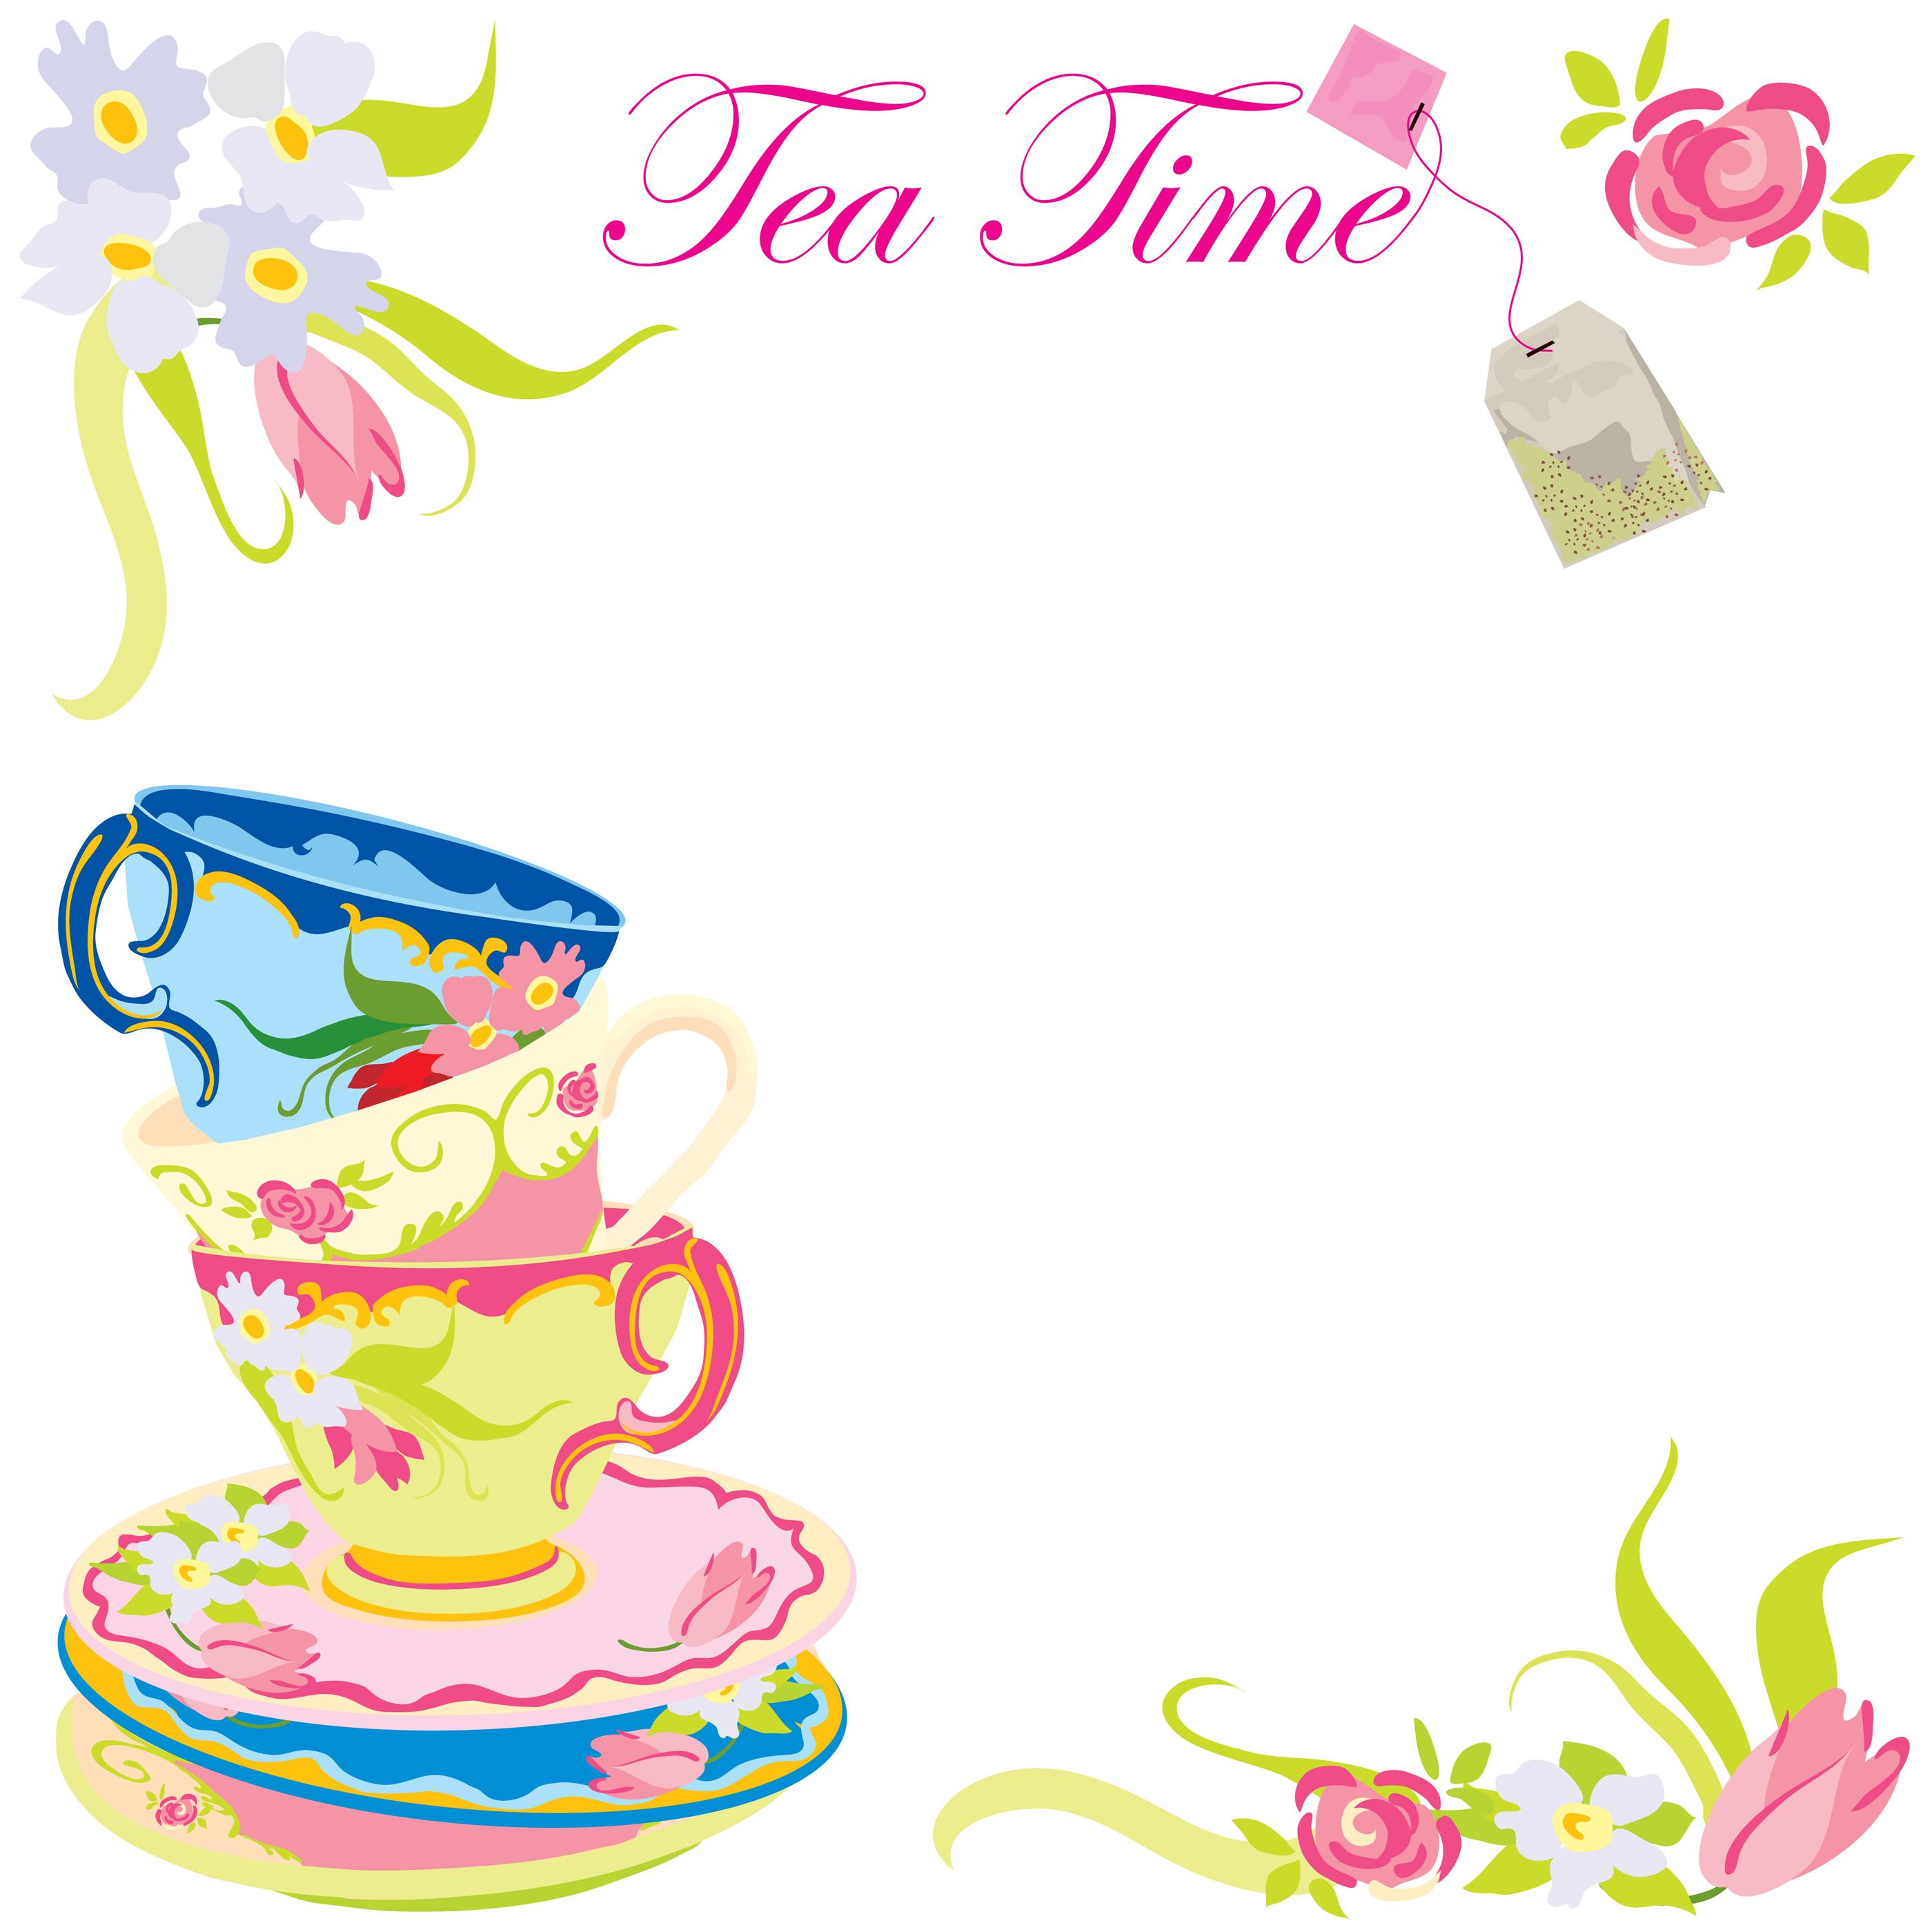 Tea Party Invitation Clipart.